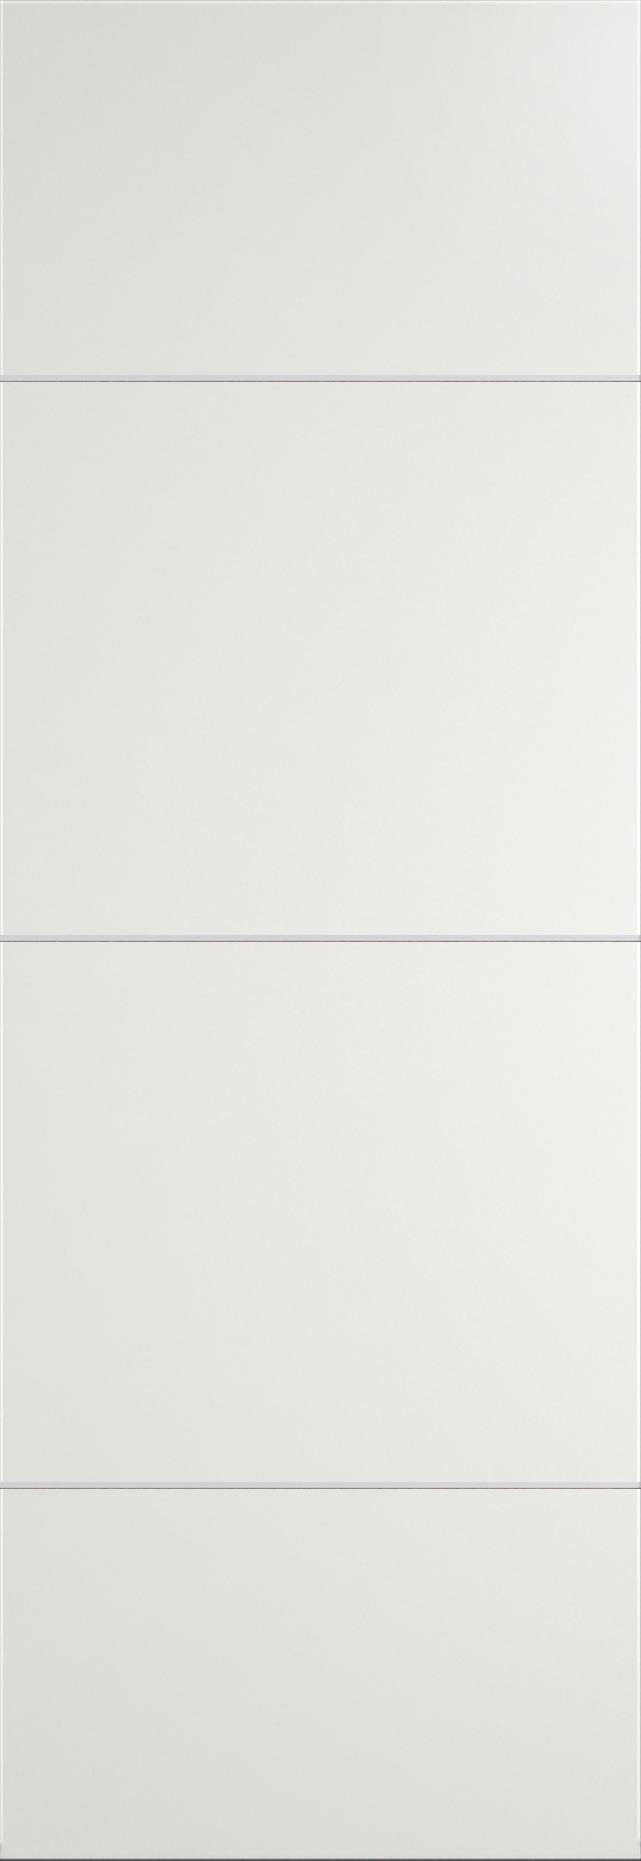 Tivoli Г-3 Invisible цвет - Бежевая эмаль Без стекла (ДГ)